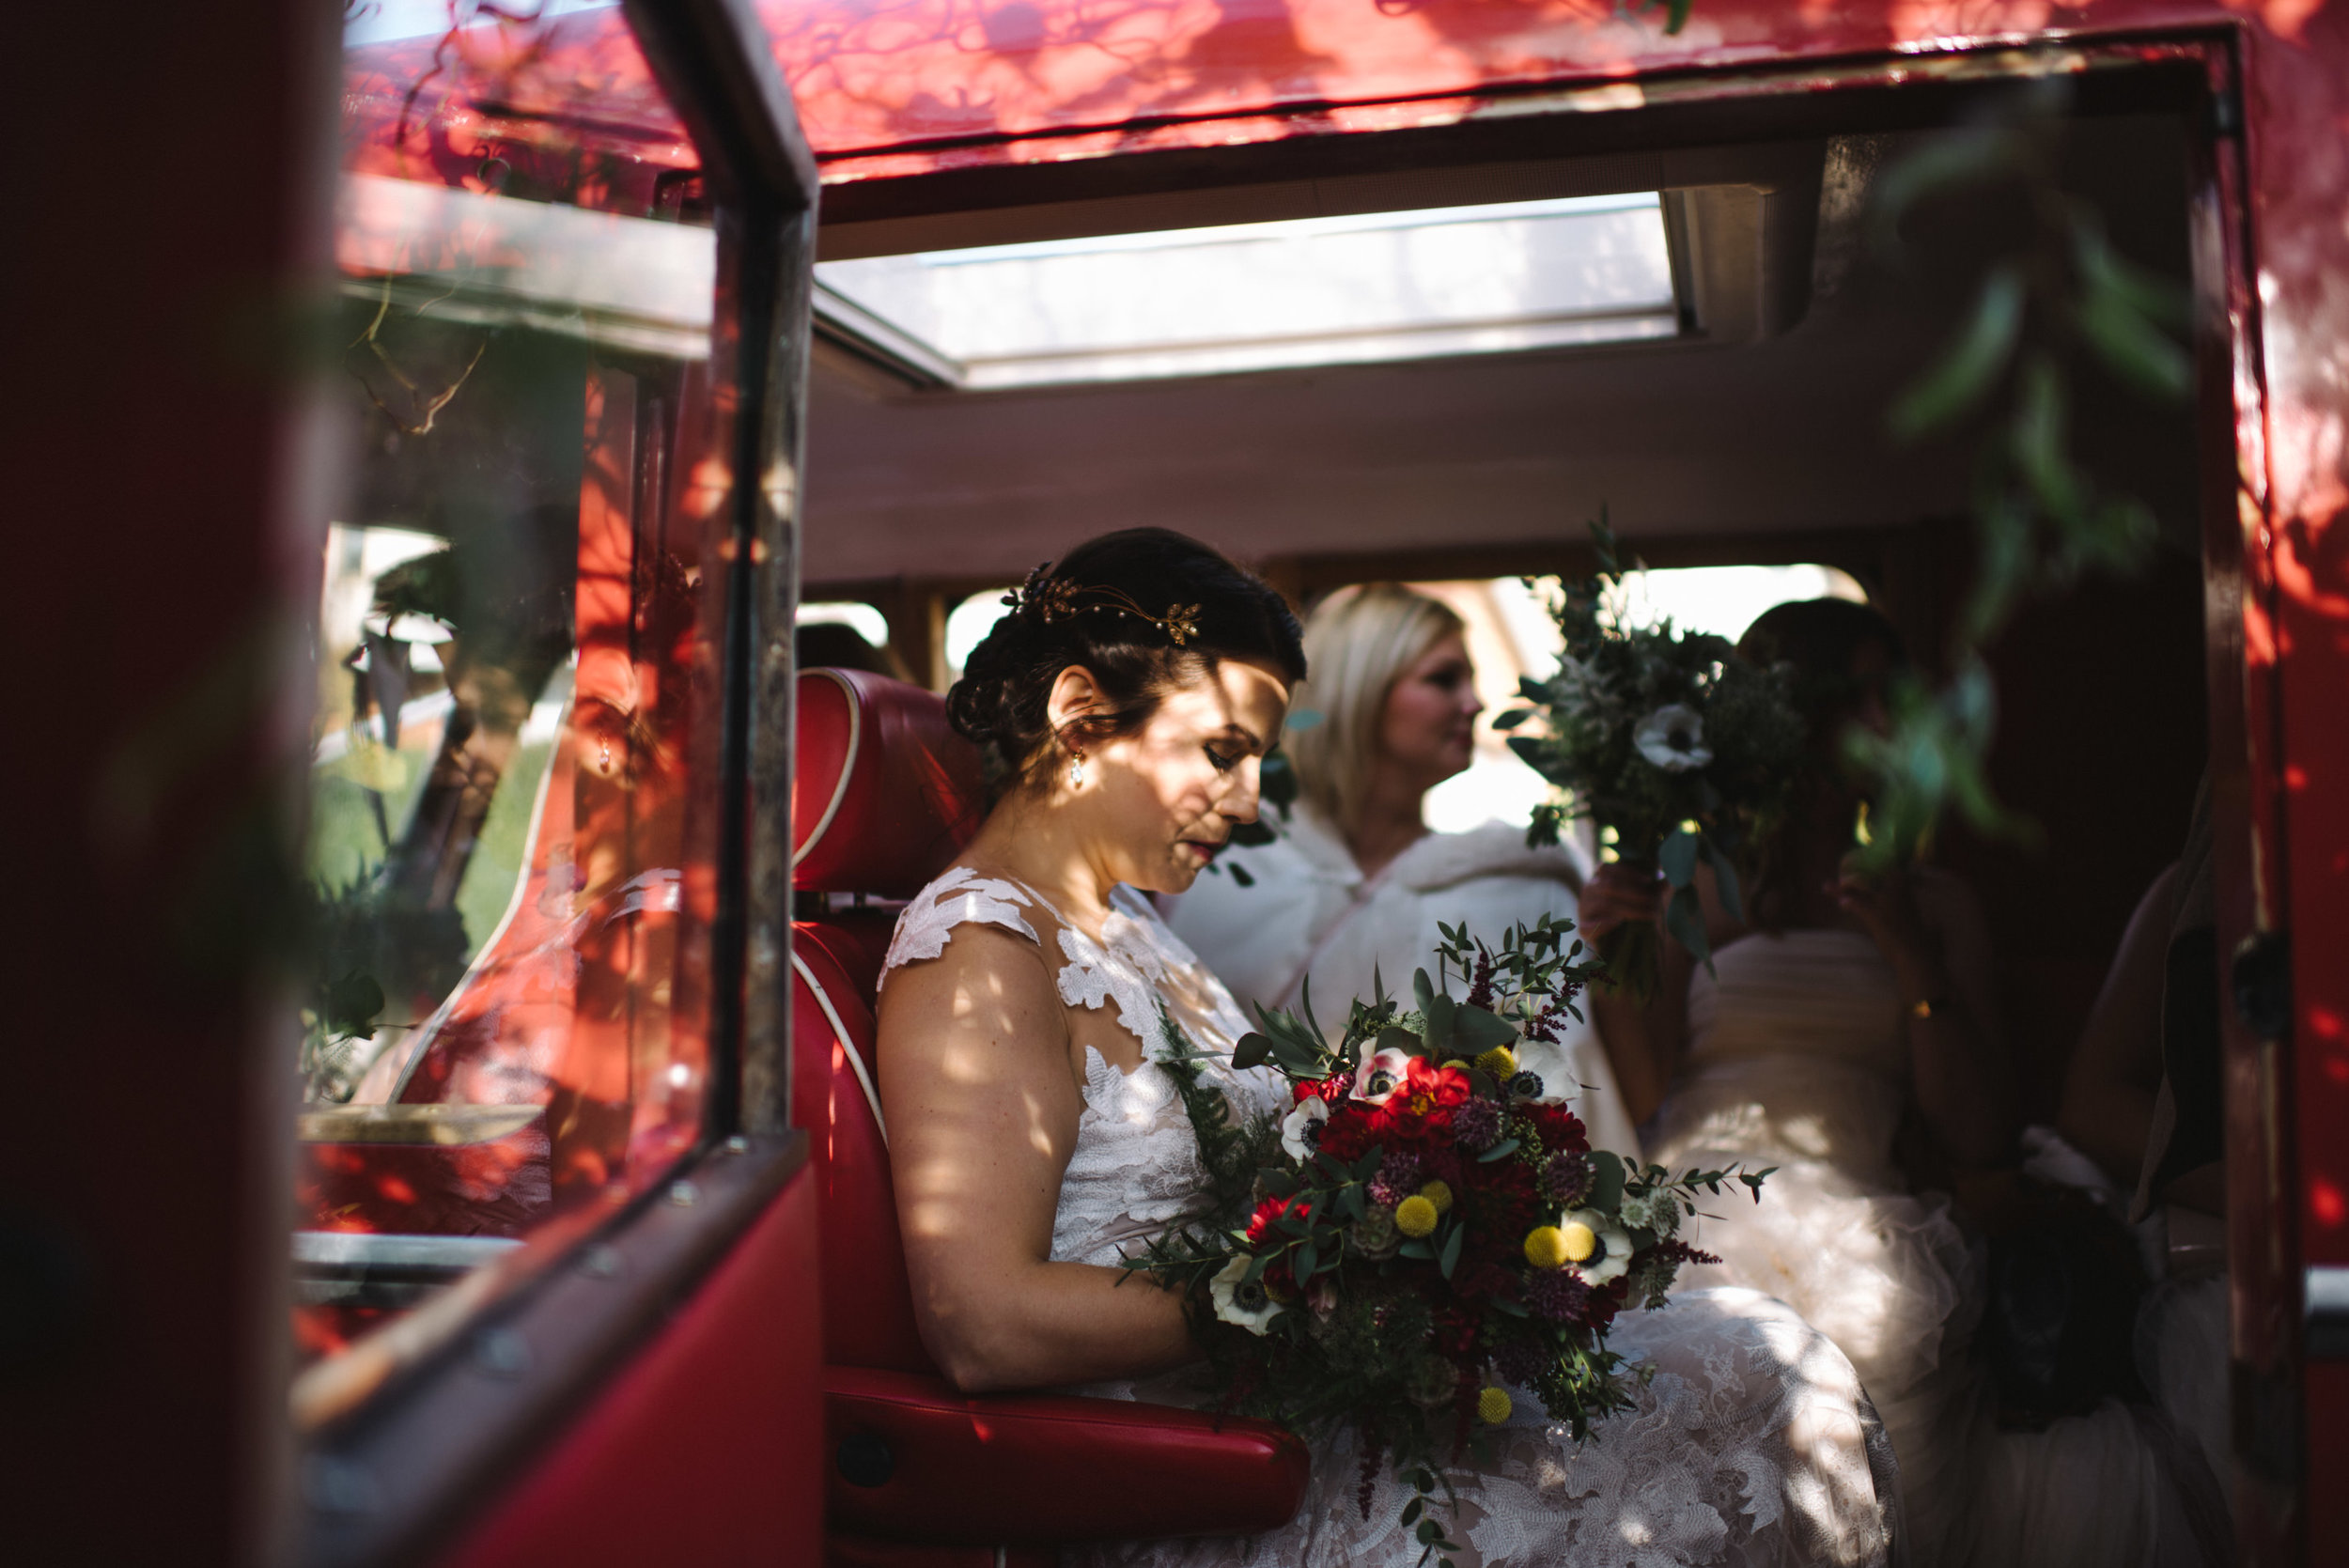 0025-LISA-DEVINE-PHOTOGRAPHY-ALTERNATIVE-WEDDING-PHOTOGRAPHY-SCOTLAND-DESTINATION-WEDDINGS-GLASGOW-WEDDINGS-COOL-WEDDINGS-STYLISH-WEDDINGS.JPG